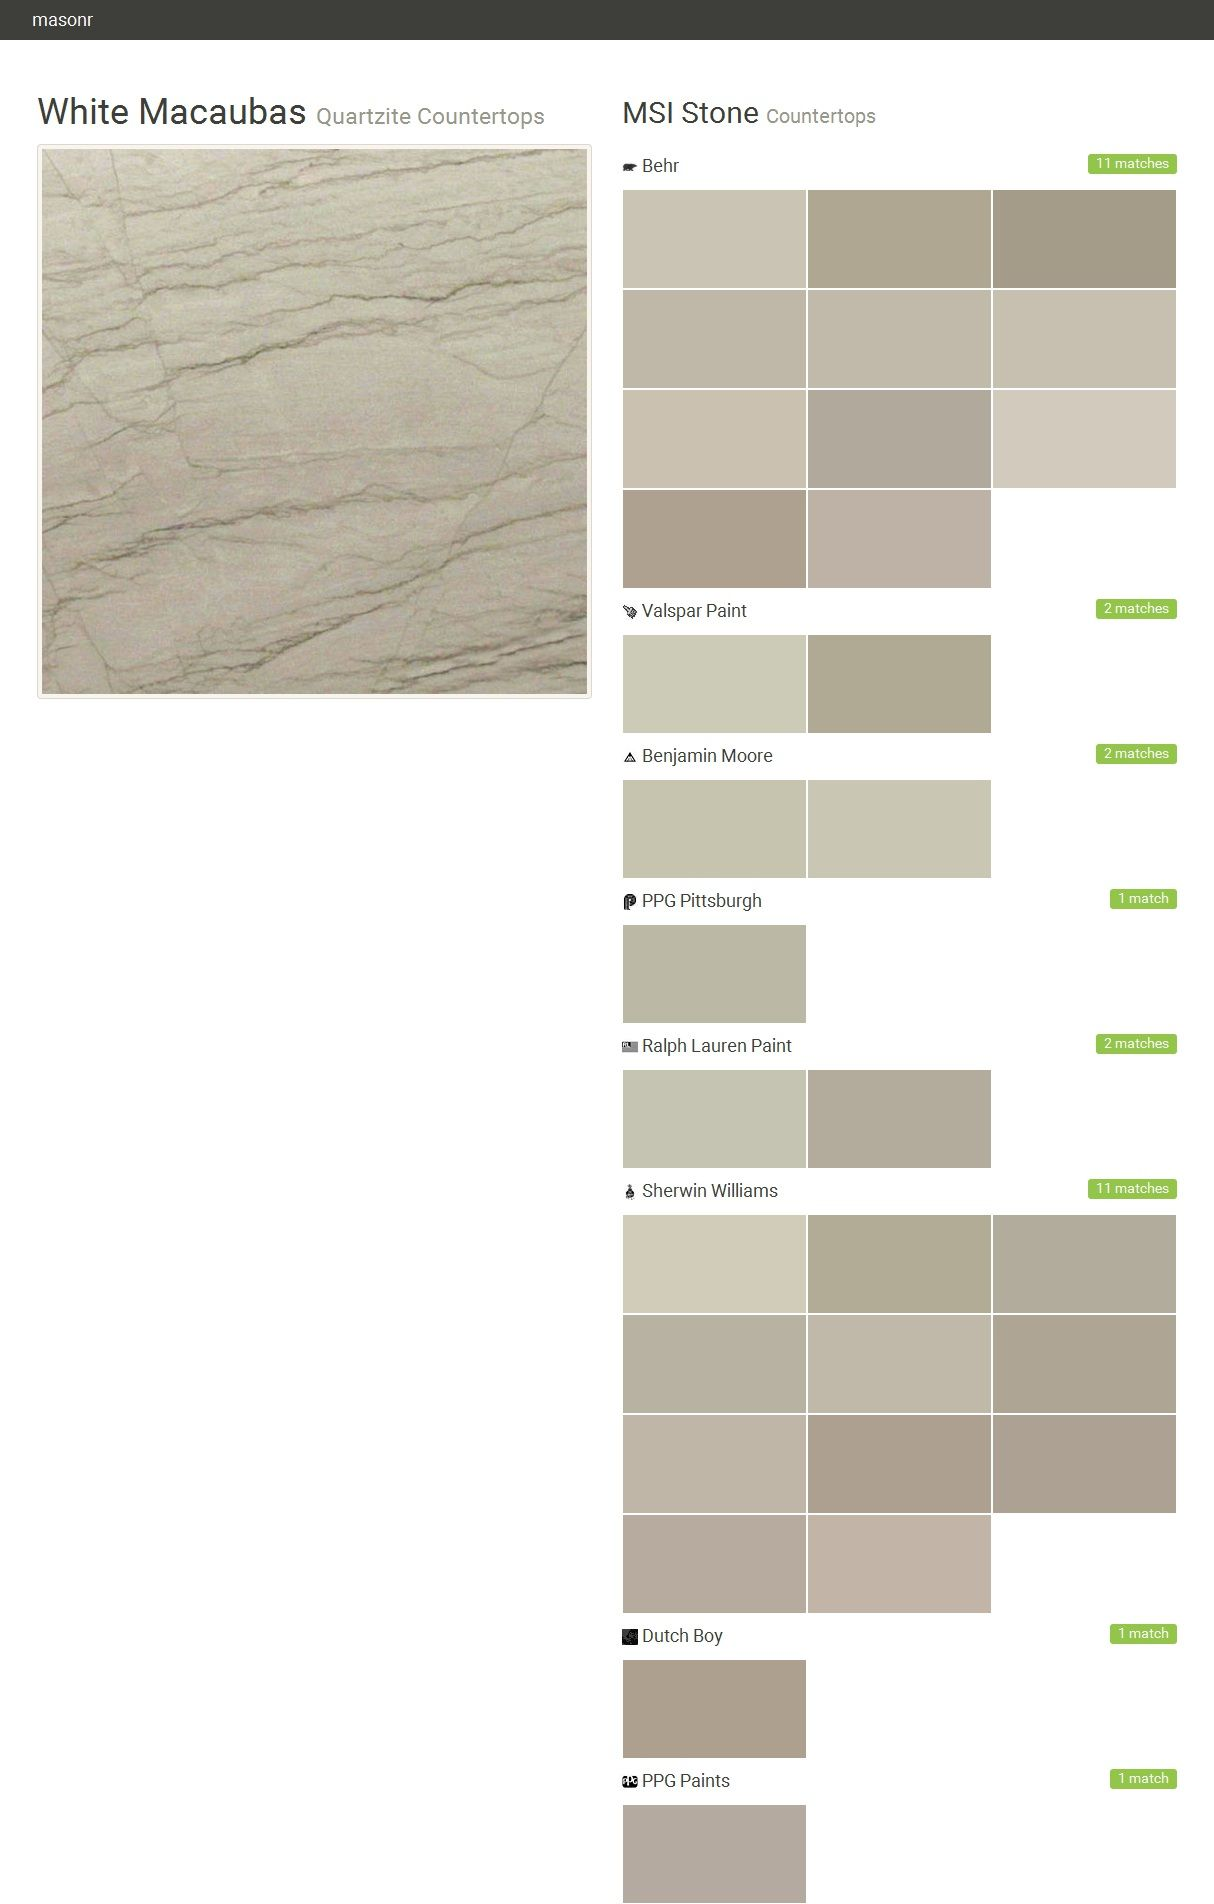 White Macaubas. Quartzite Countertops. Countertops. MSI Stone. Behr.  Valspar Paint.